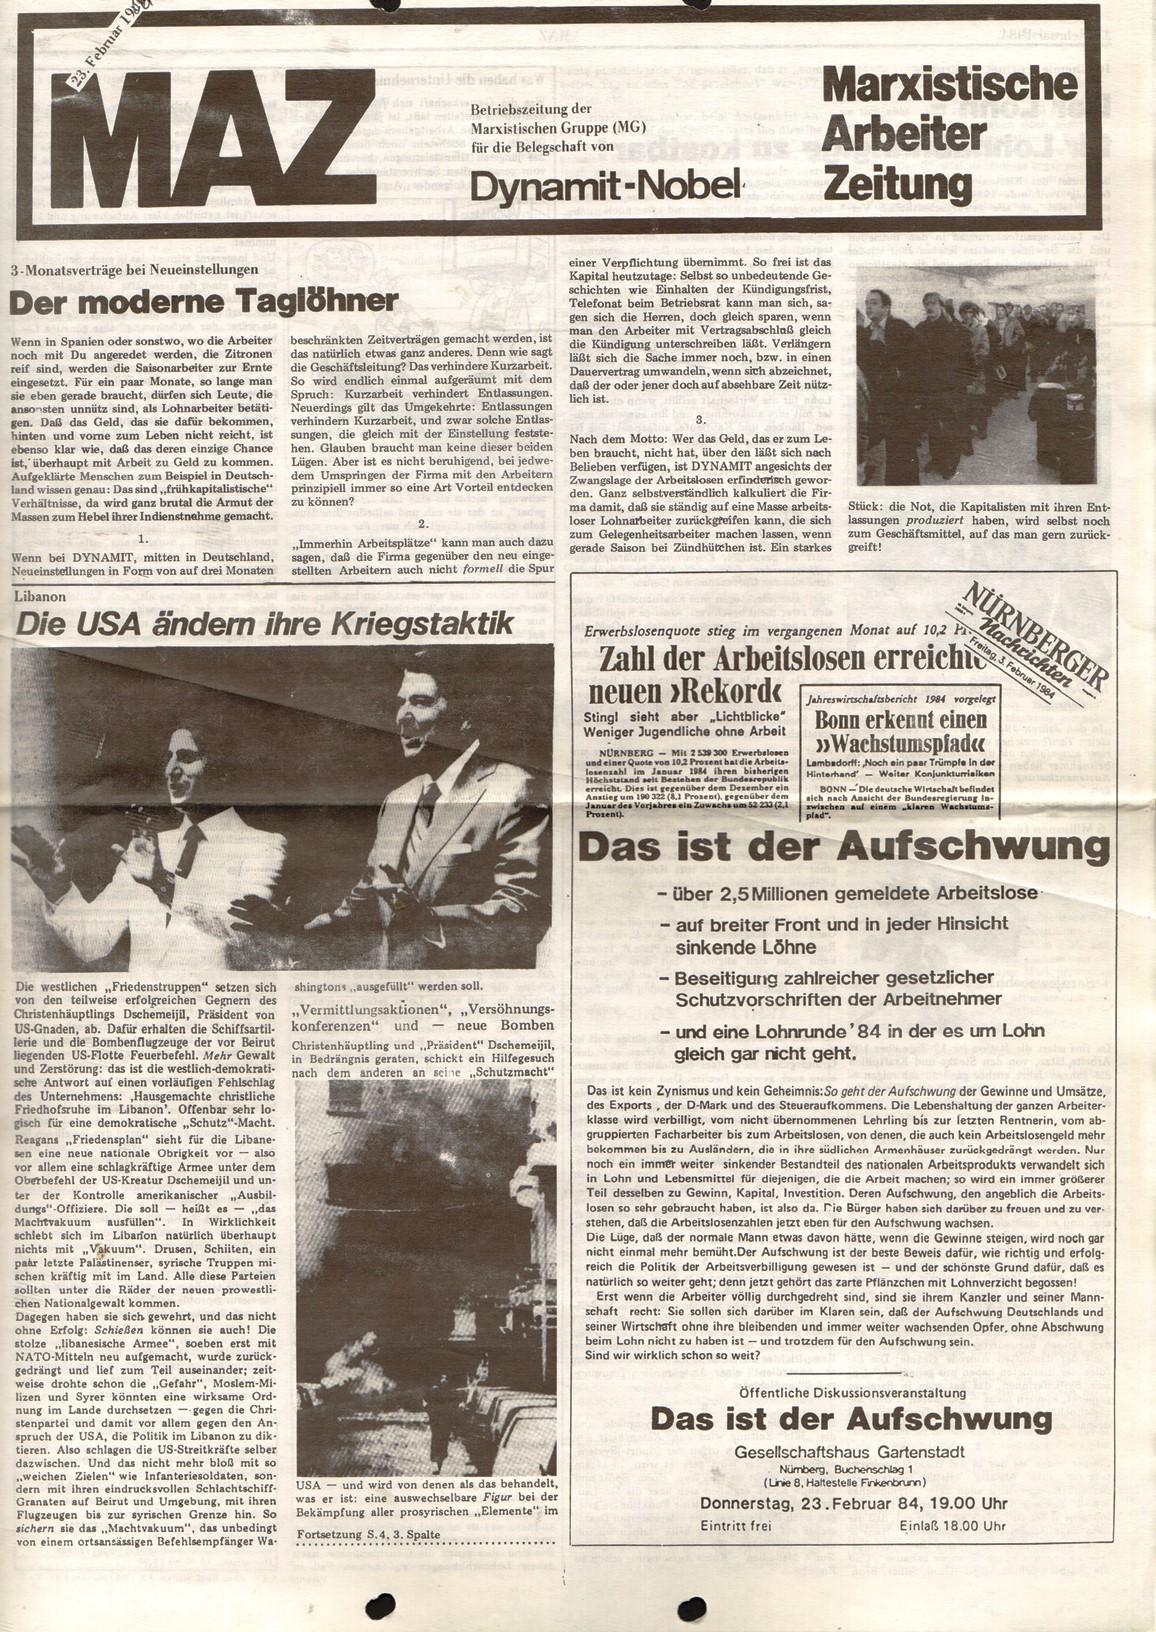 Fuerth_MG_MAZ_Dynamit_Nobel_19840223_01